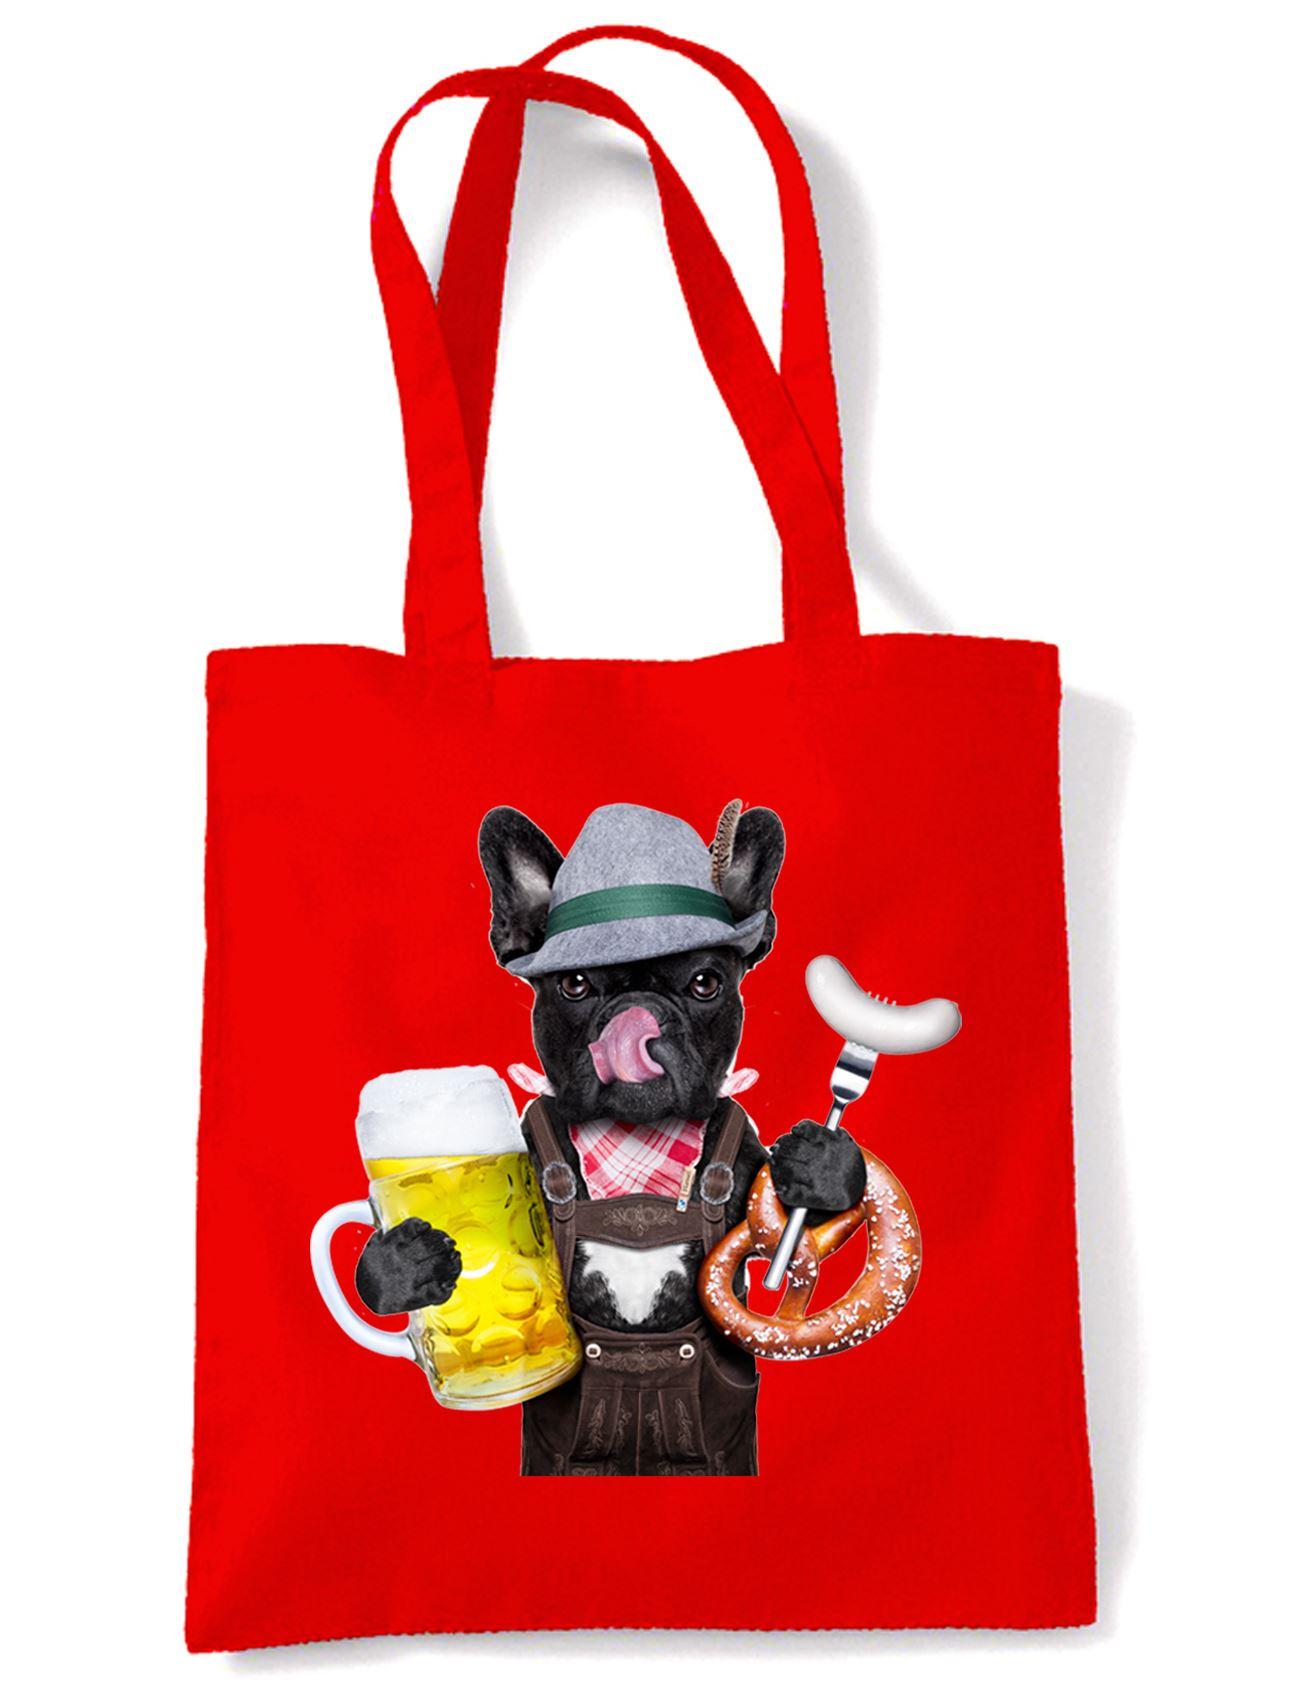 French-Bulldog-Bavarian-Beer-Style-Tote-Shoulder-Bag-Funny-Pet-Bull-Dog